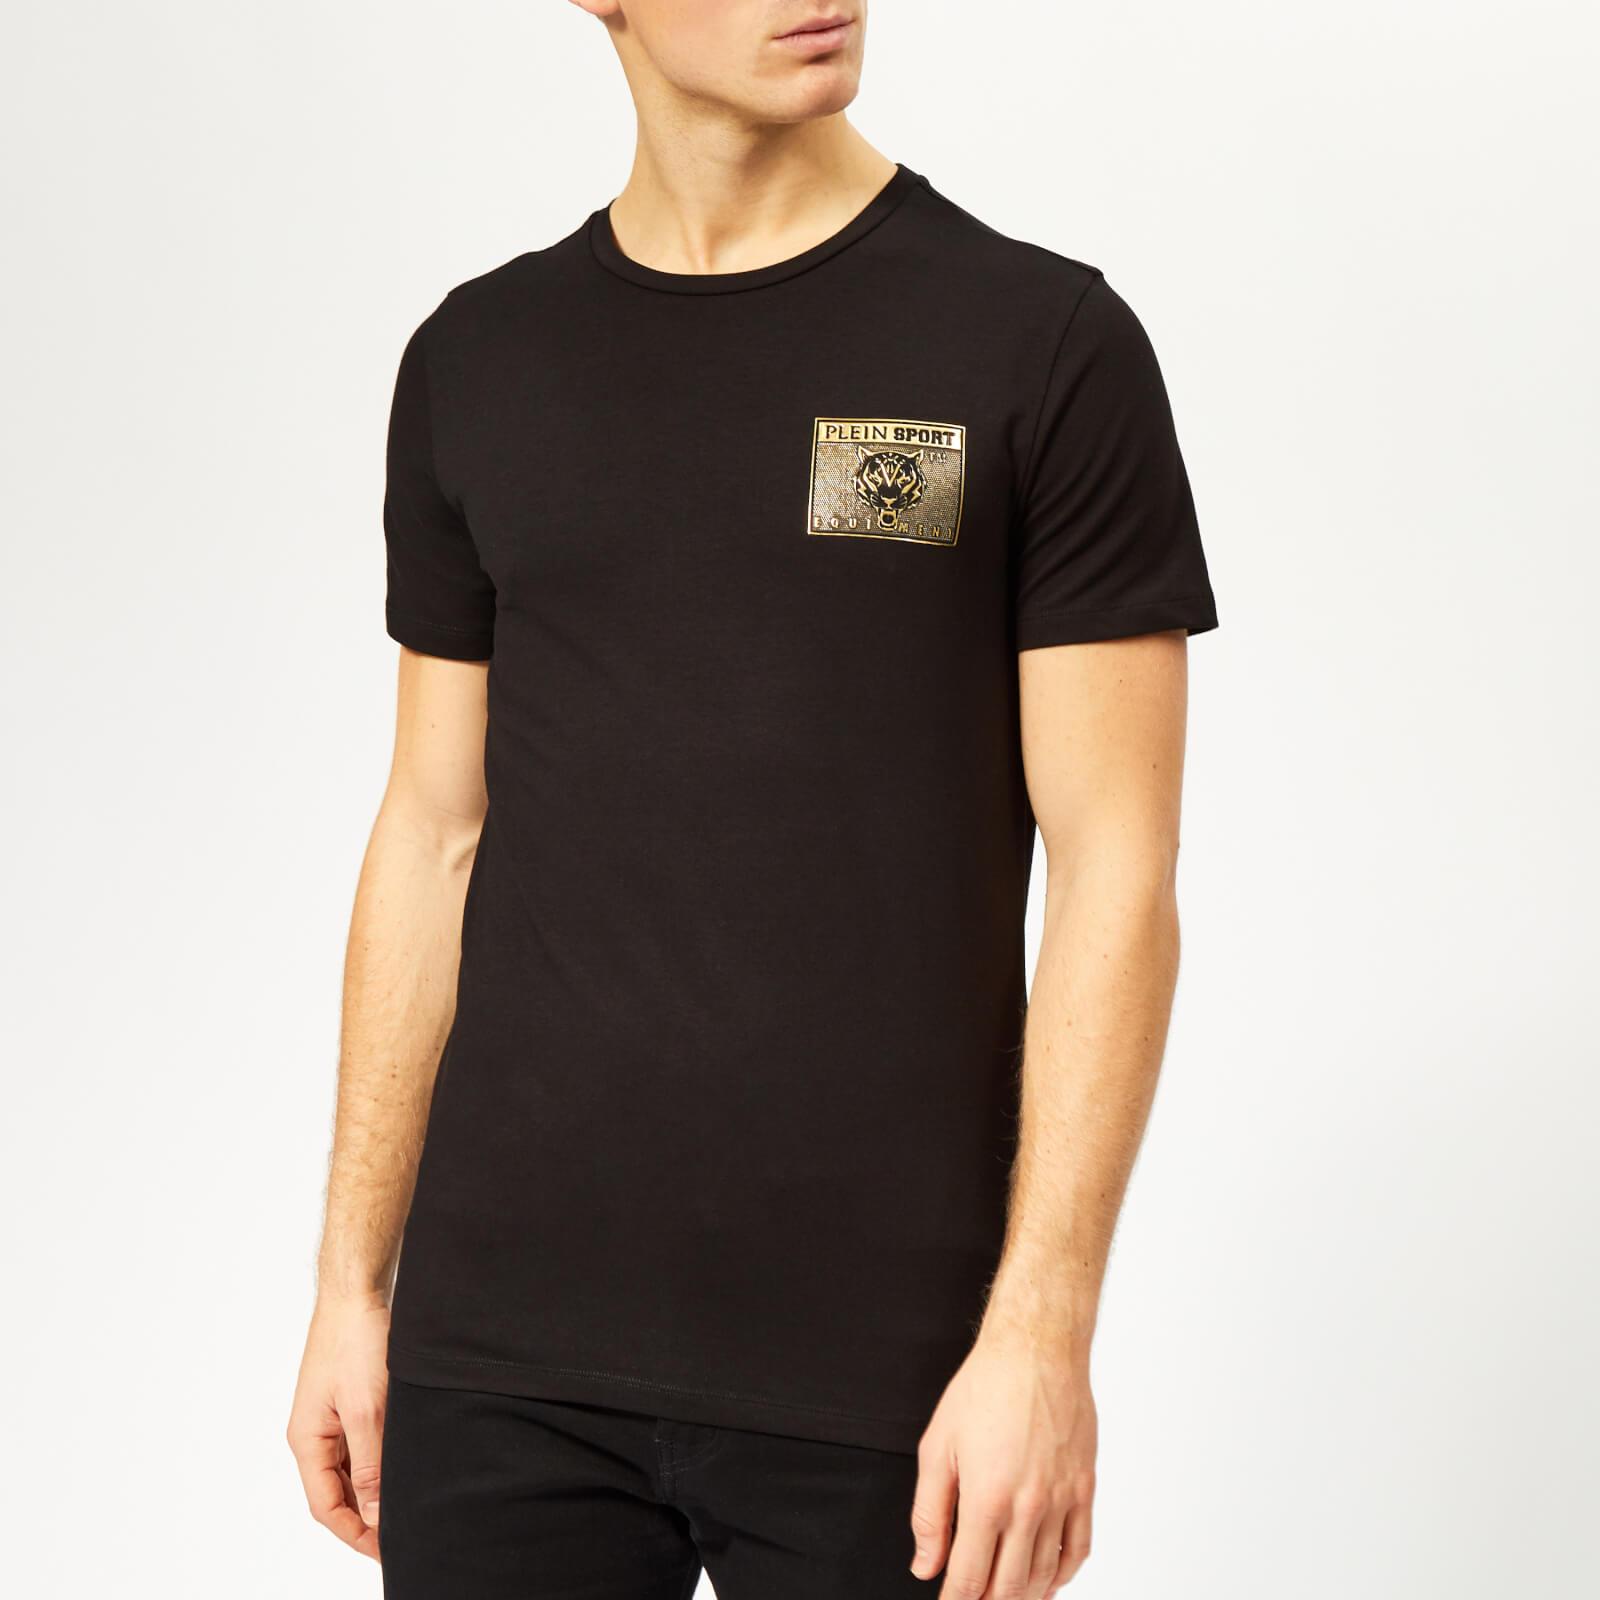 Plein Sport Men's Metal Sport T-Shirt - Black/Gold - L - Black/Gold